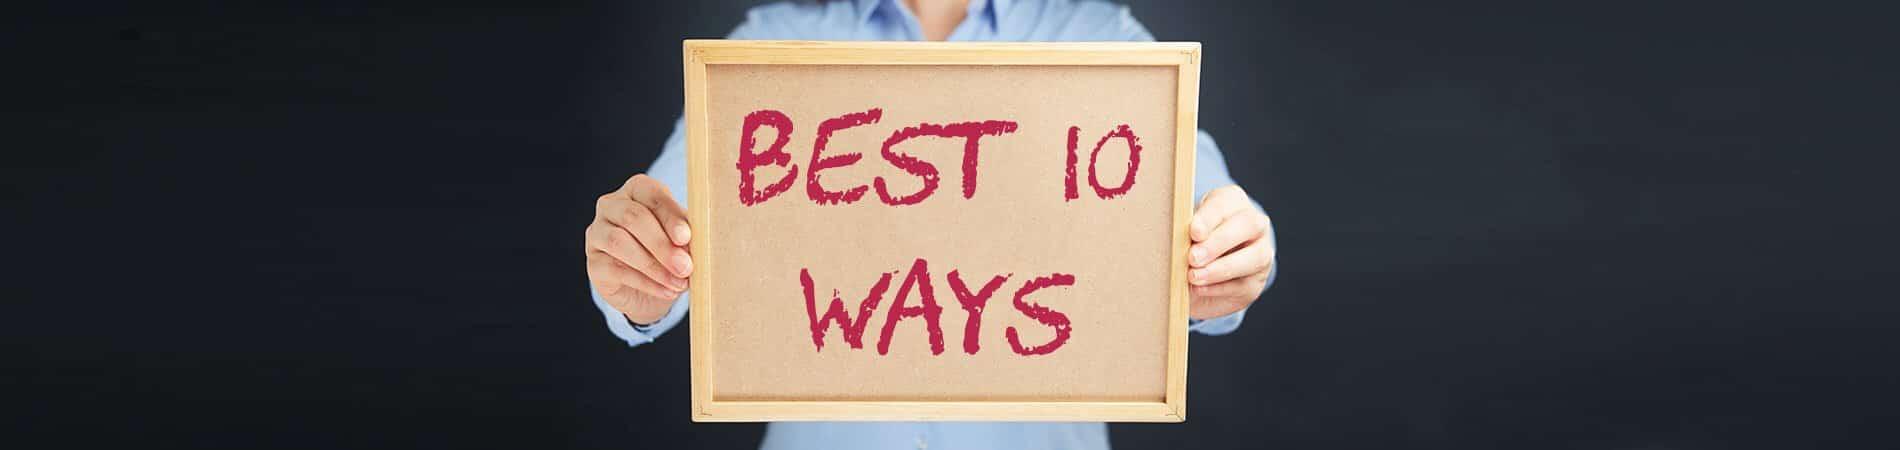 Best 10 Ways to Manage Your Finances